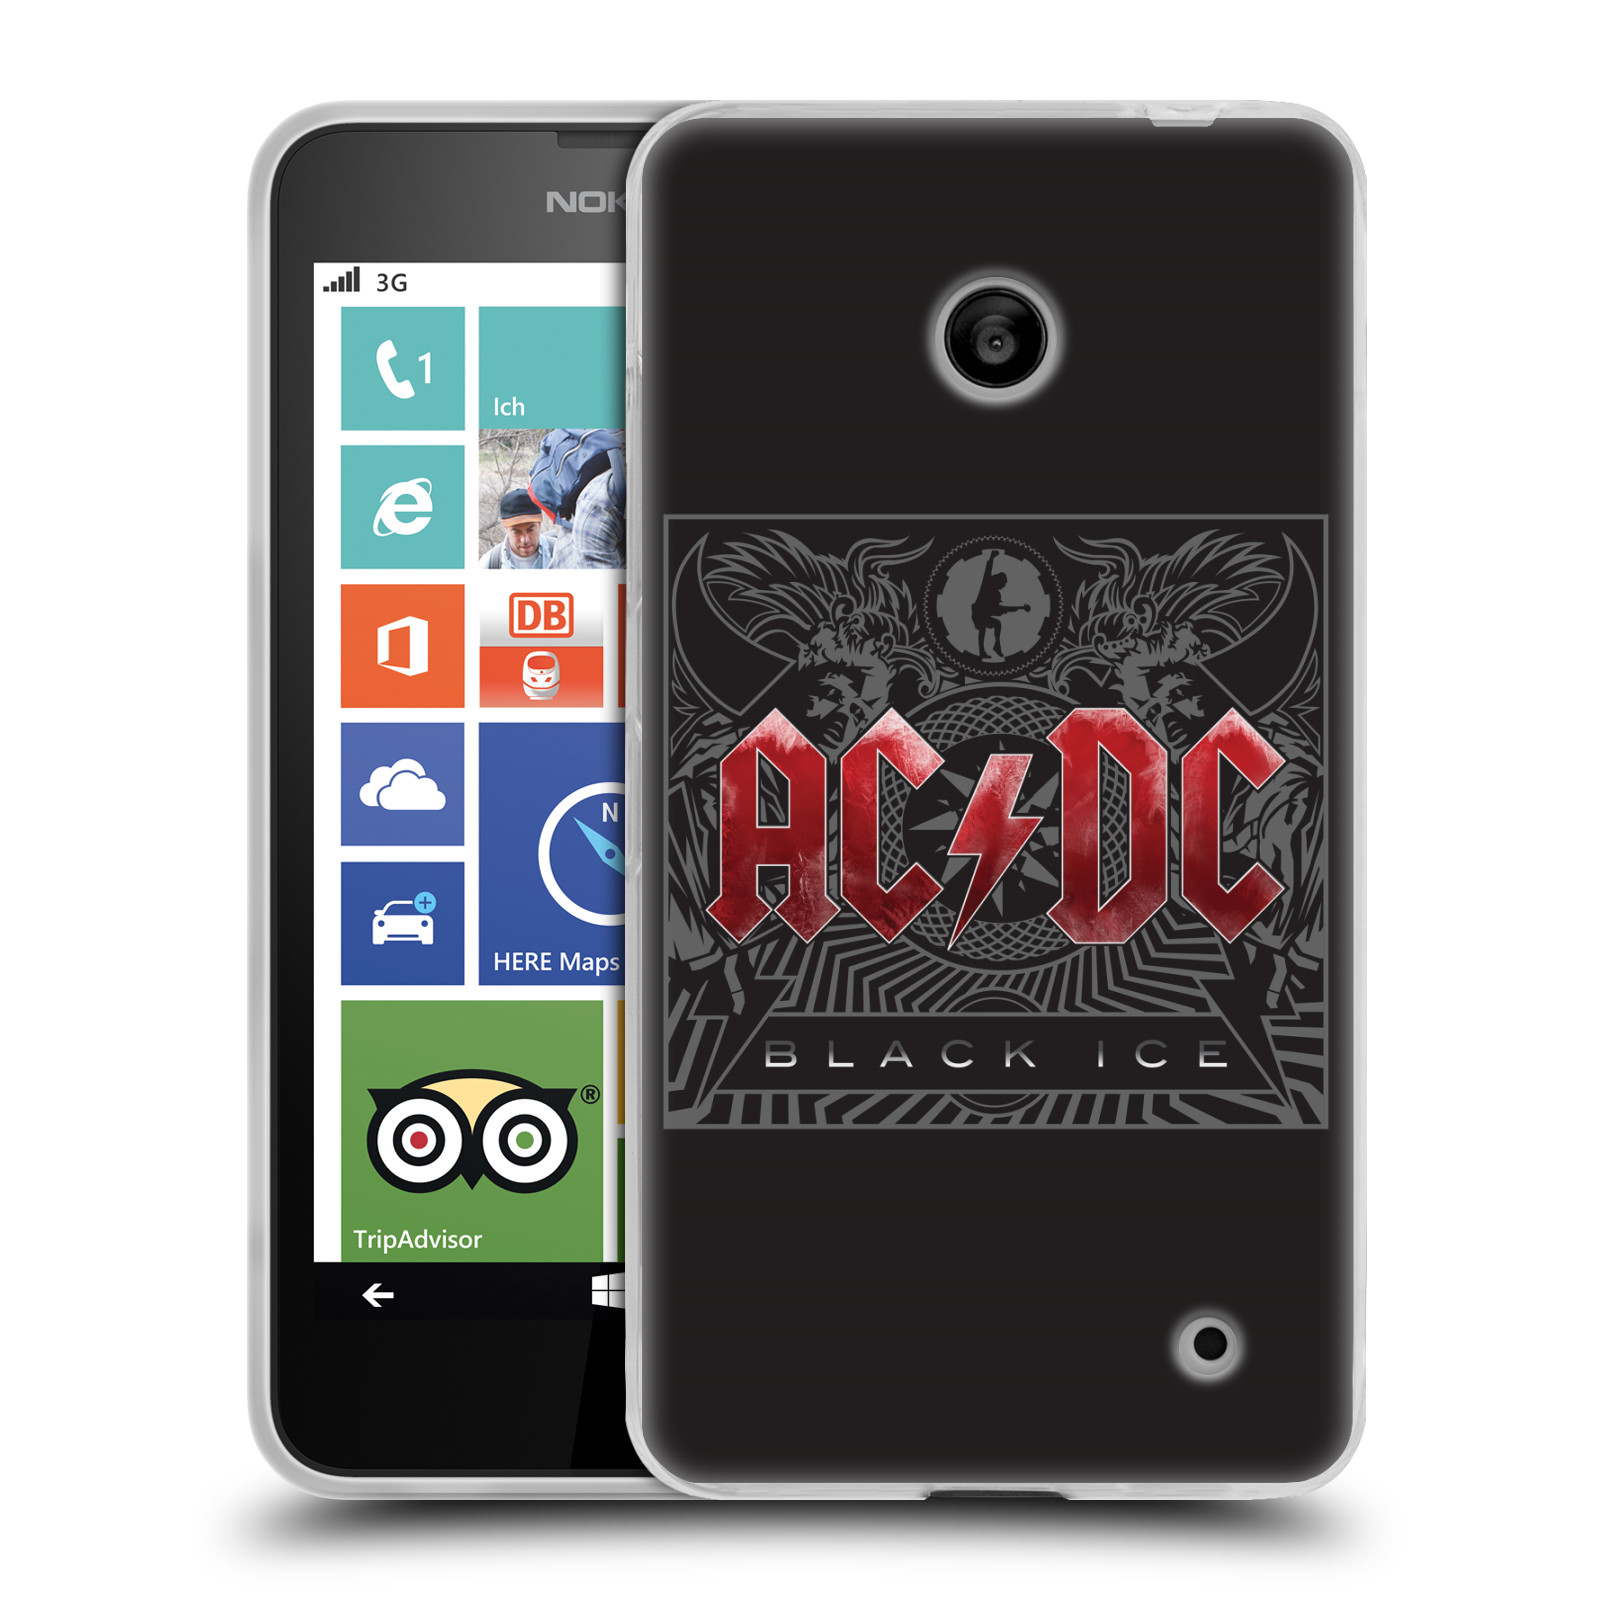 Silikonové pouzdro na mobil Nokia Lumia 630 HEAD CASE AC/DC Black Ice (Silikonový kryt či obal na mobilní telefon s oficiálním motivem australské skupiny AC/DC pro Nokia Lumia 630 a Nokia Lumia 630 Dual SIM)